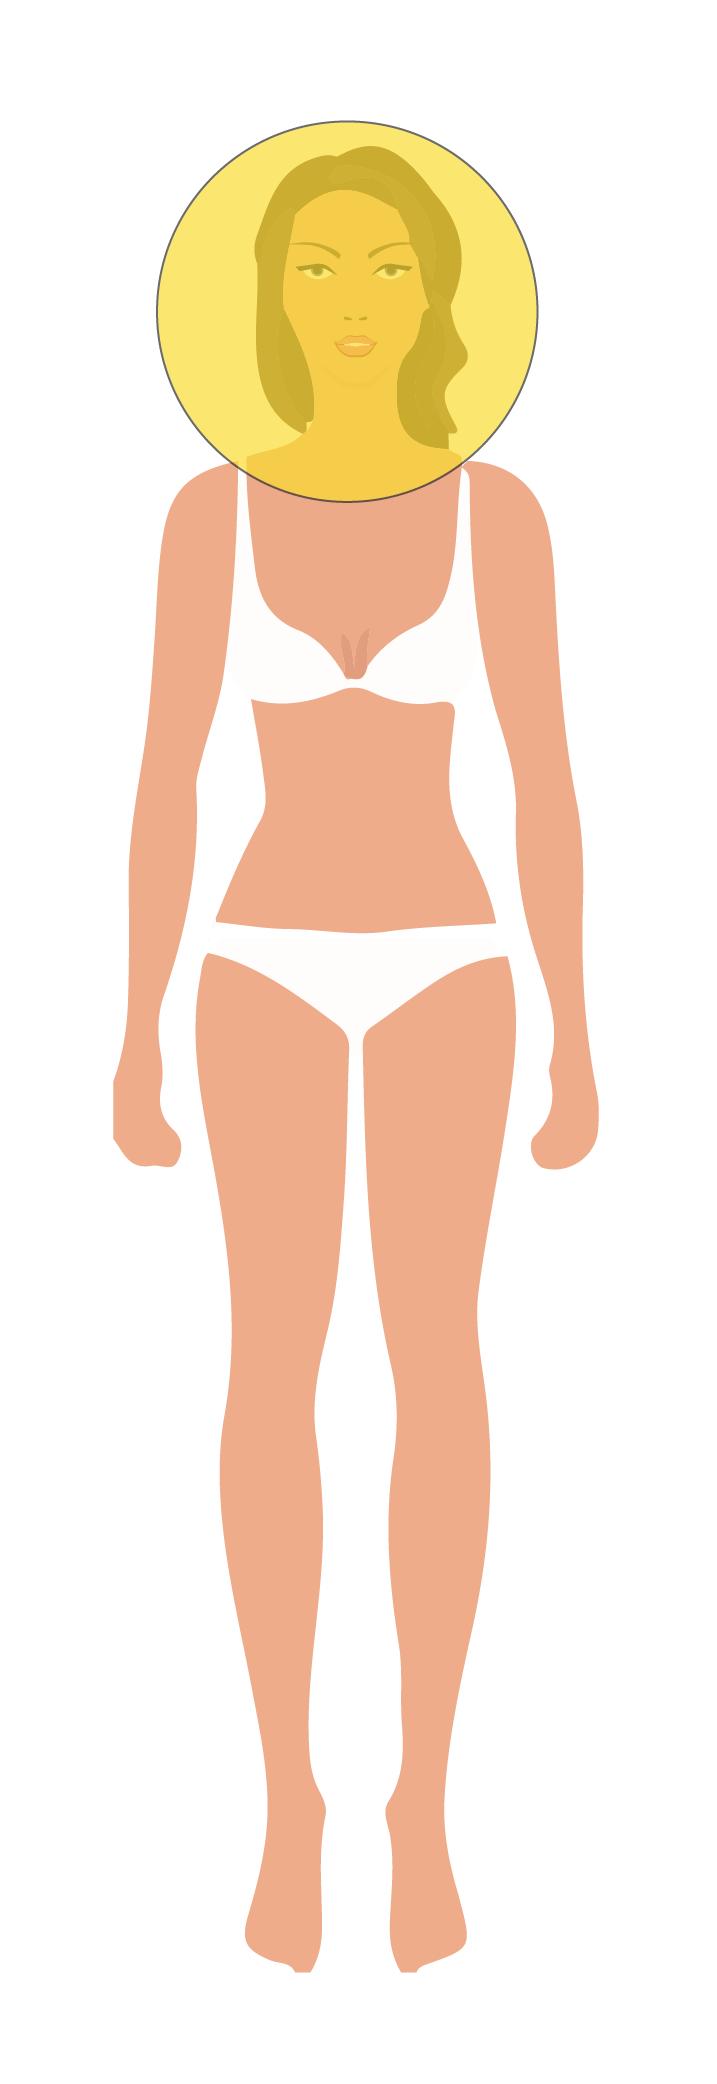 target-area-juvederm-vollure-female